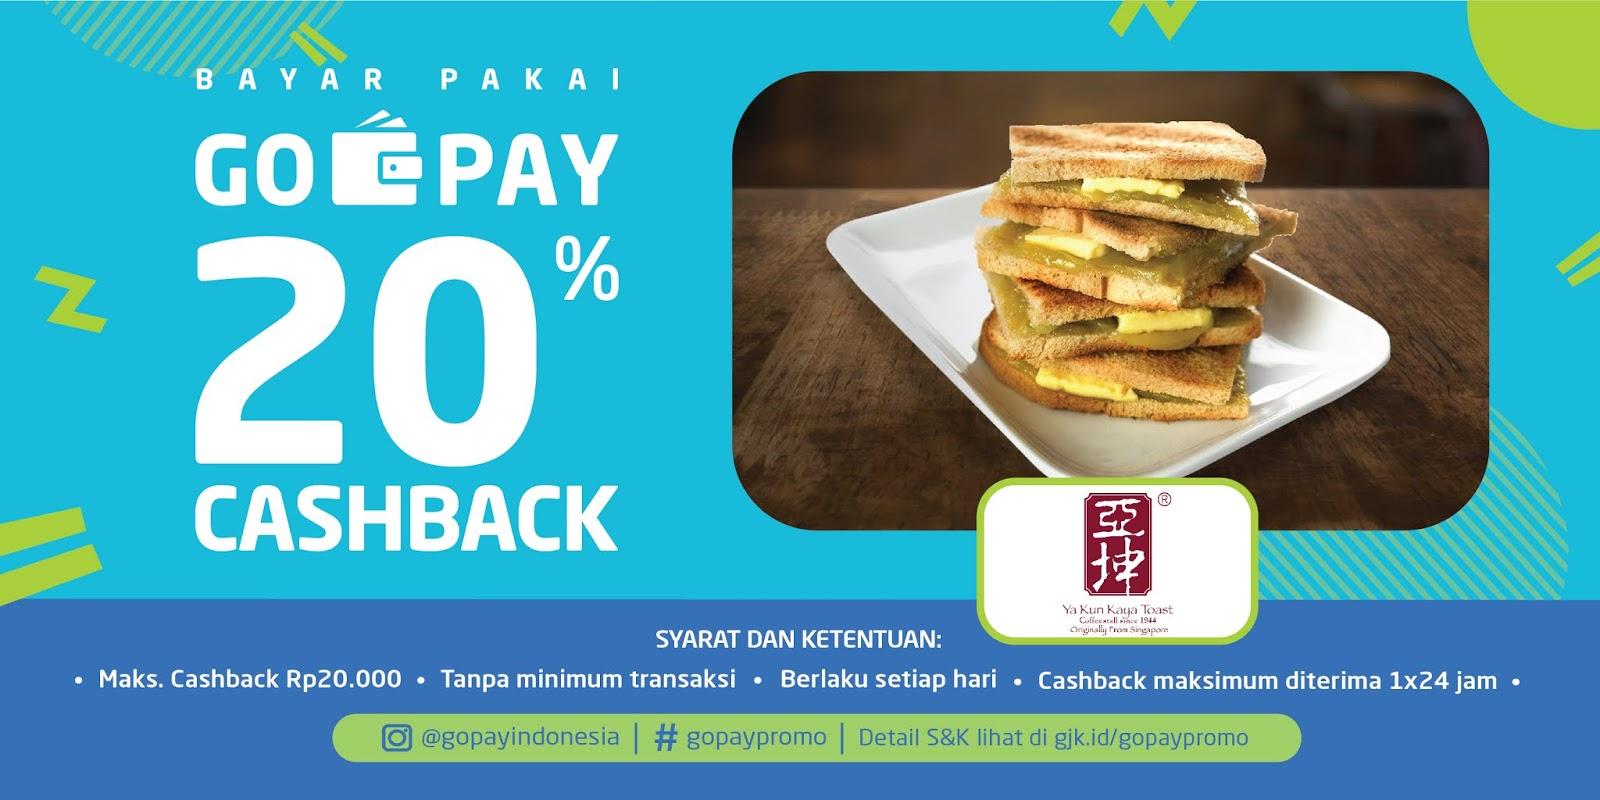 Gojek - Promo Ya Kun Kaya Toast Cashback 20% Pakai GoPay (s.d 23 Des 2018)